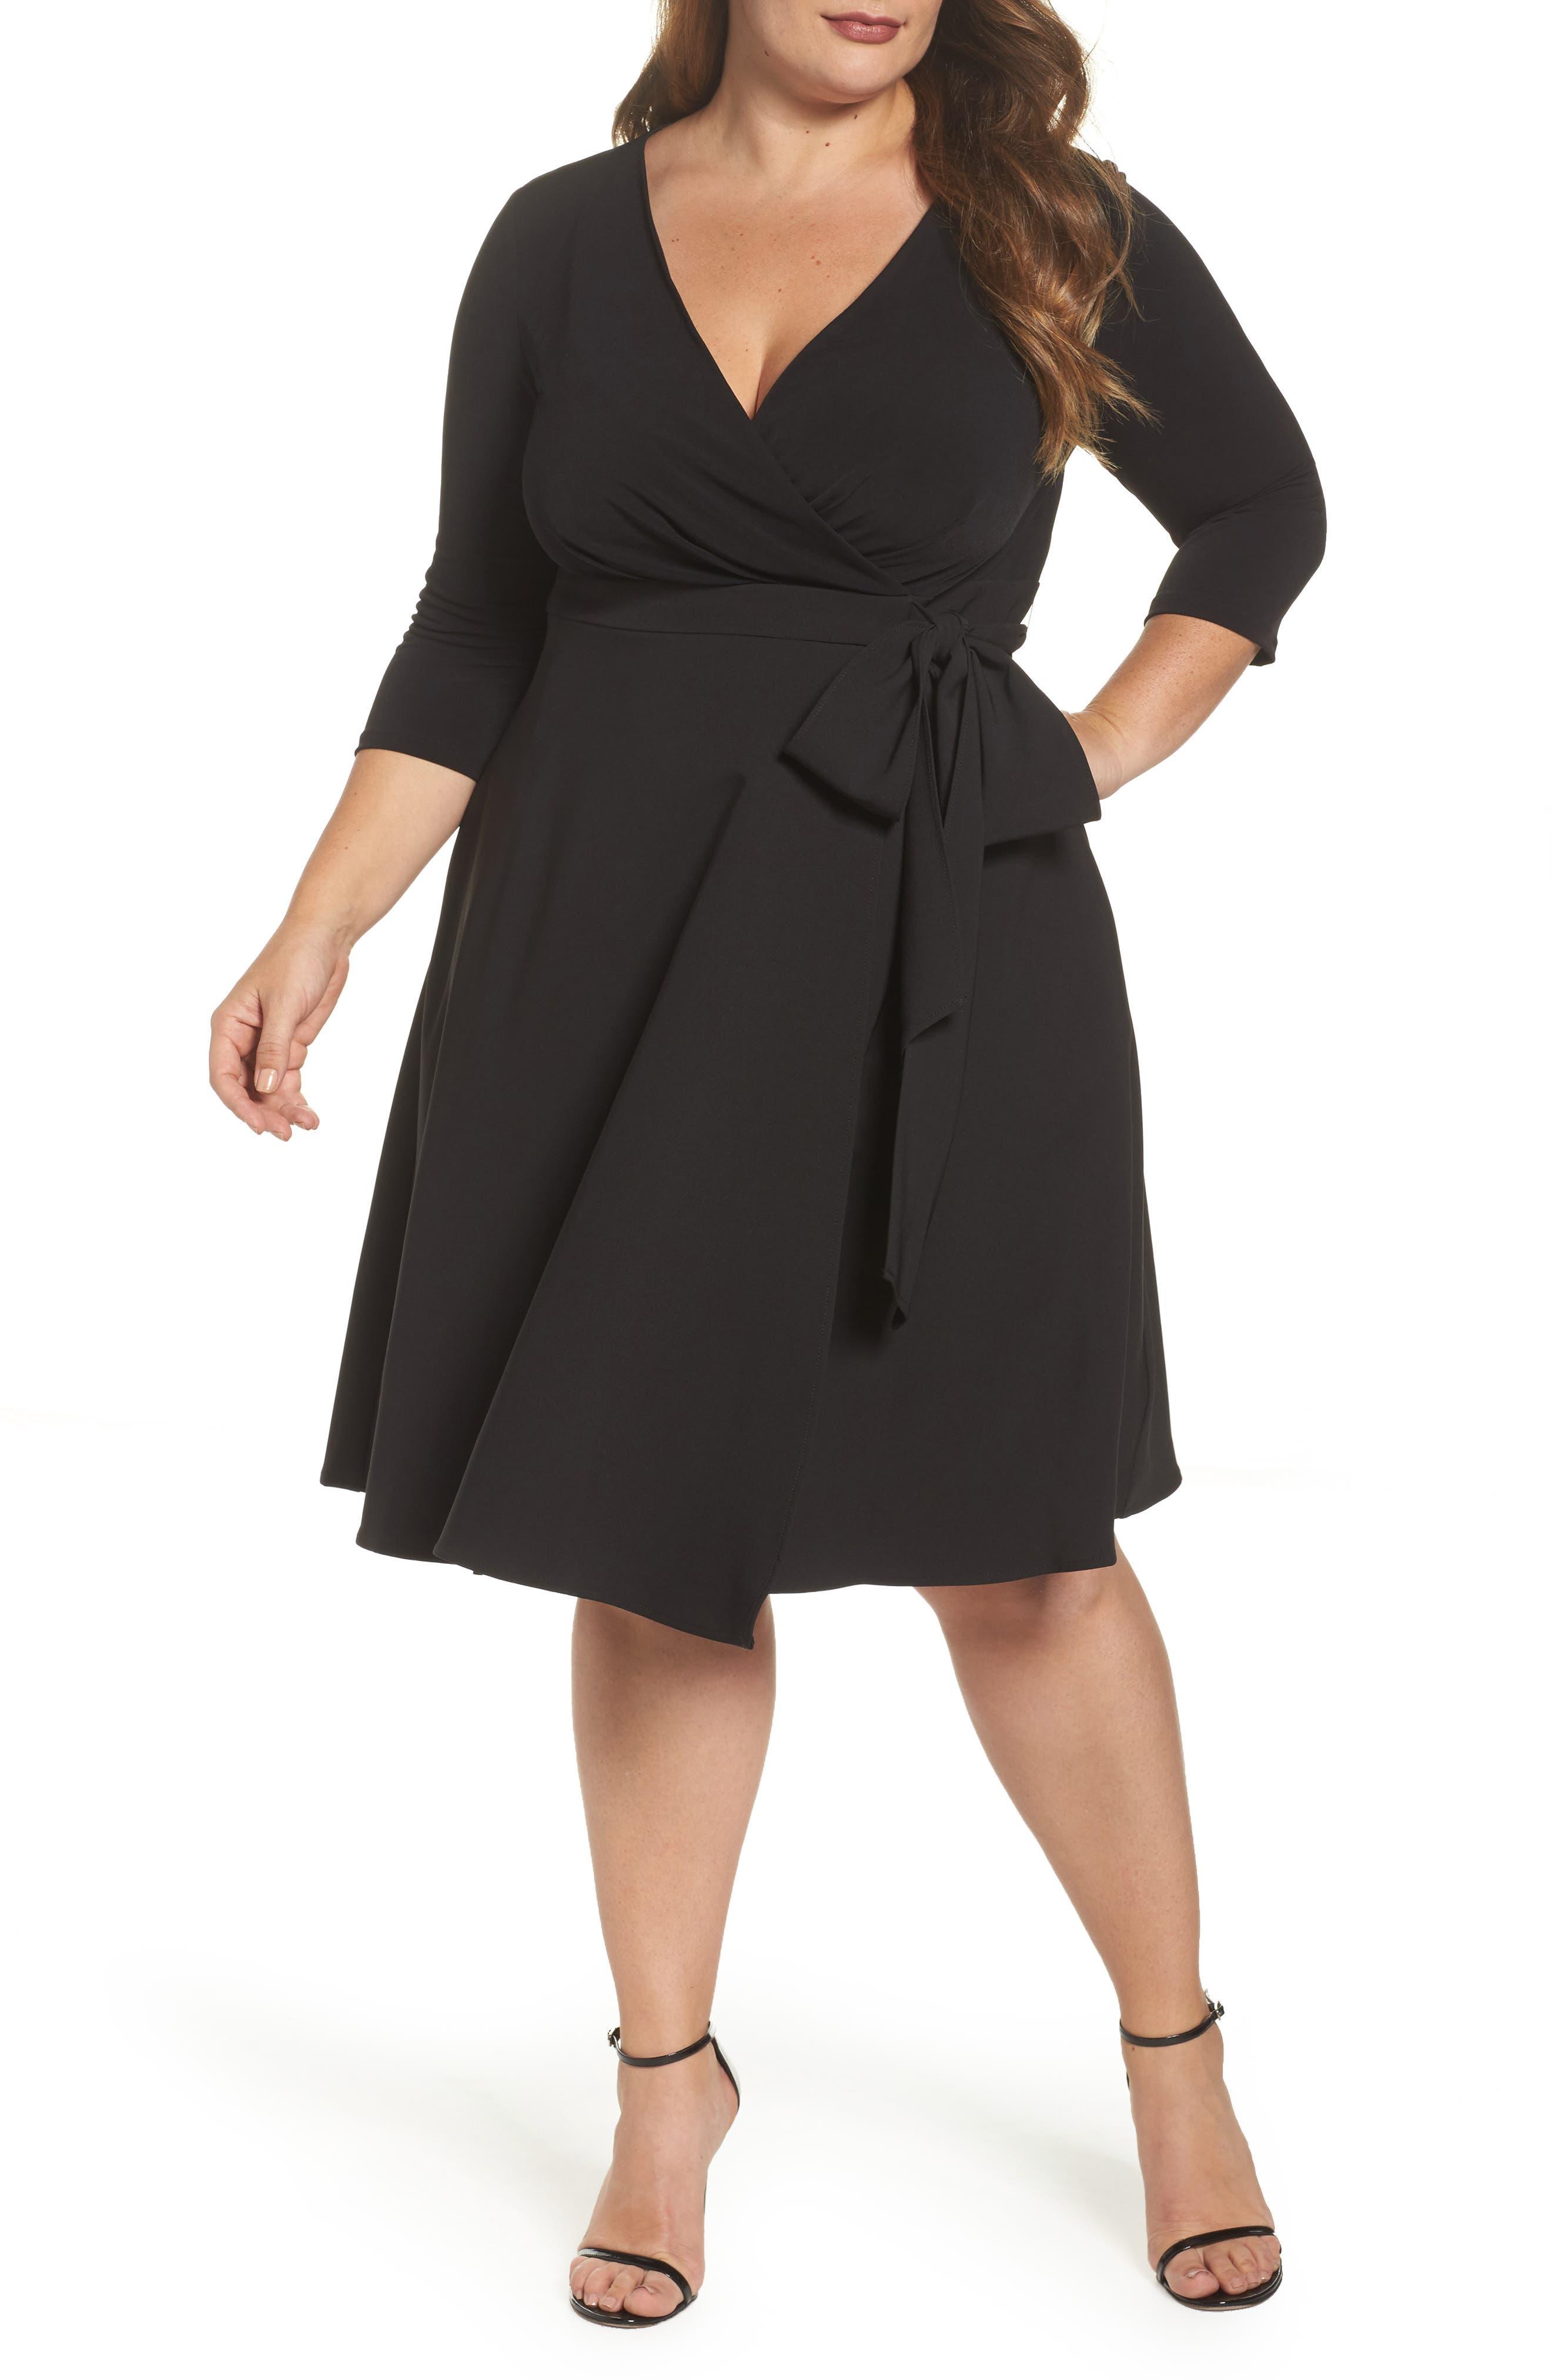 Sangria Mixed Media Faux Wrap Dress (Plus Size)